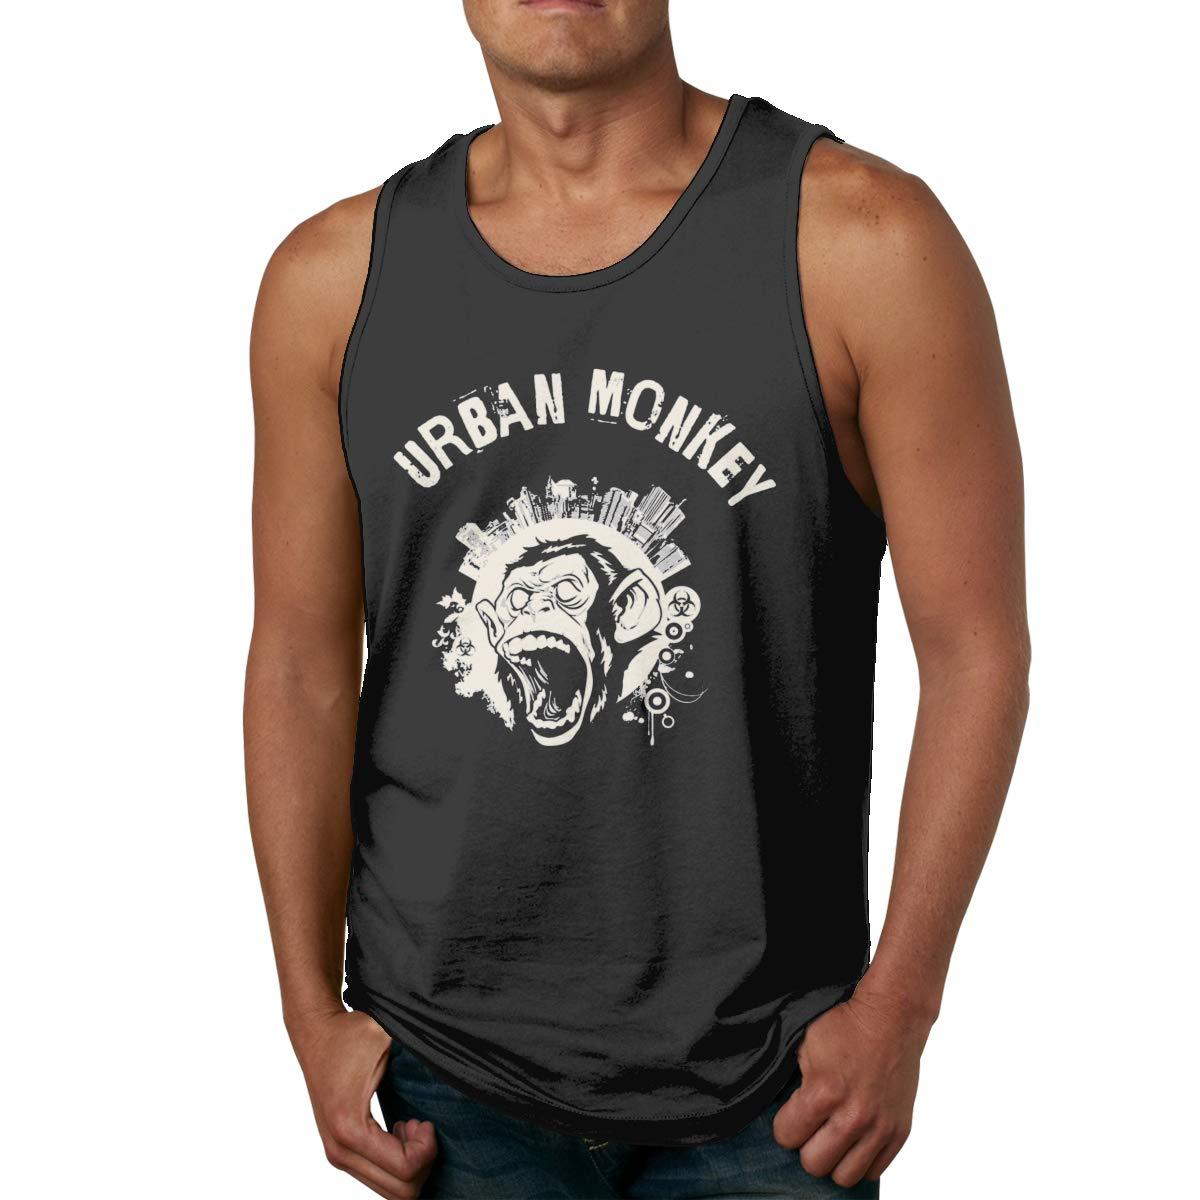 LLXM Urban Monkey Men Printed Vest Sports Tank-Top T Shirt Leisure Tees Sleeveless Shirts